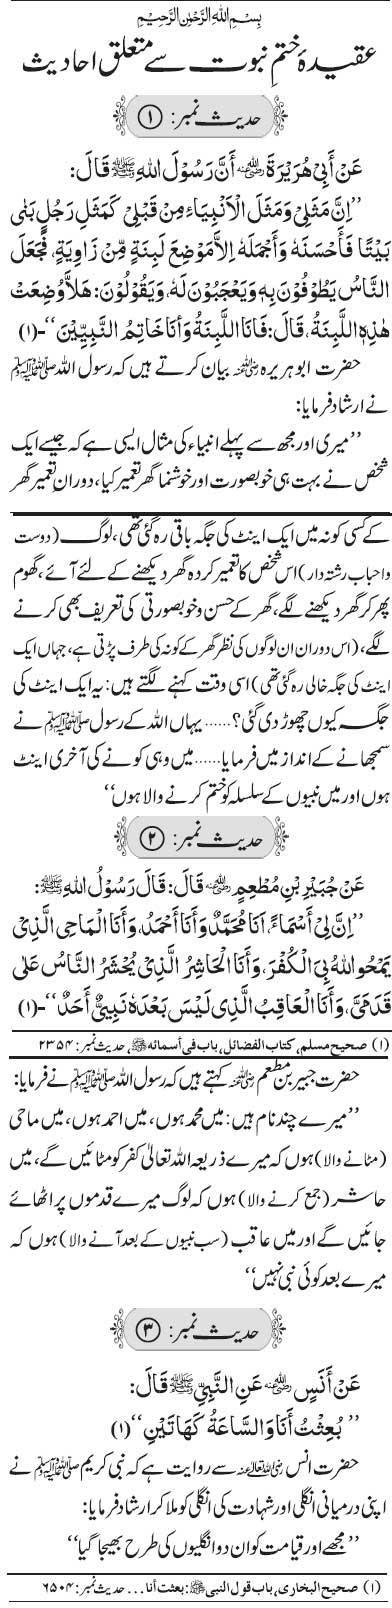 Aqeeda Khatm e Nabuwat Hadith